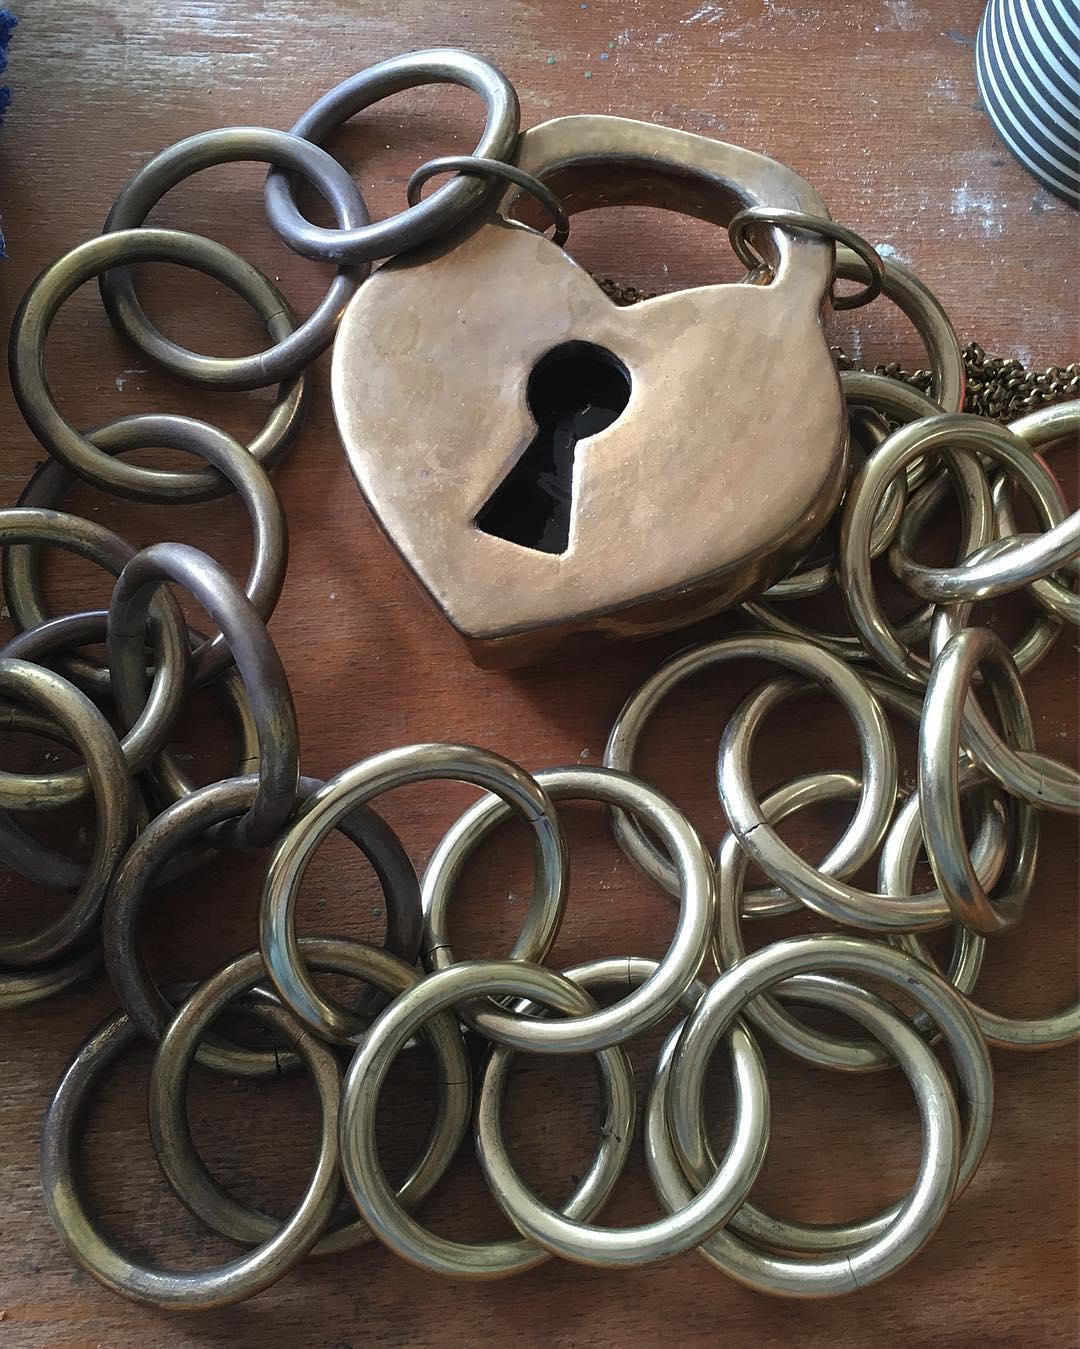 #polishing #giant #charmbracelet #jewellery #ceramic #lock